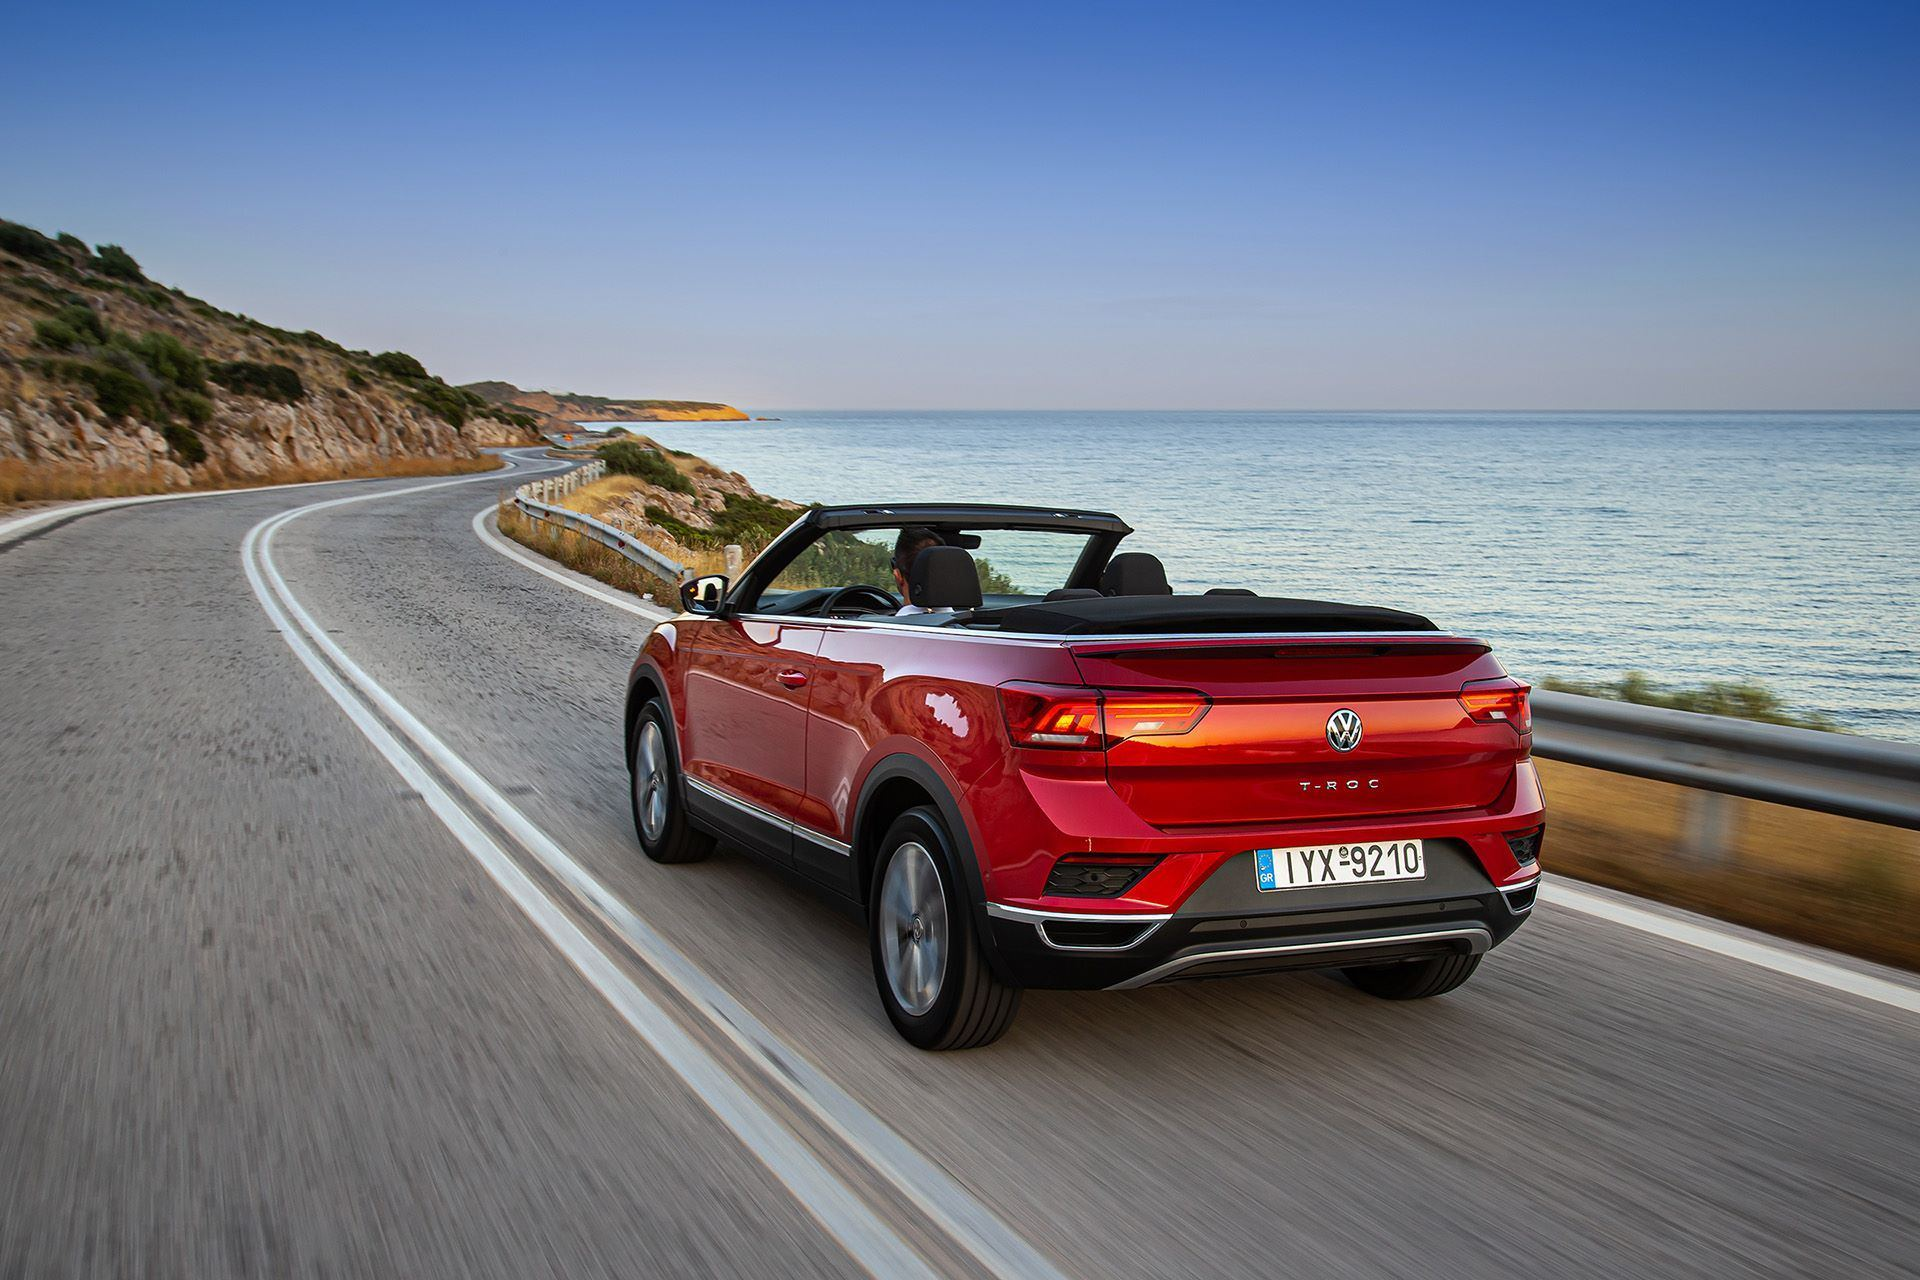 Volkswagen-T-Roc-Cabriolet-Greece-41